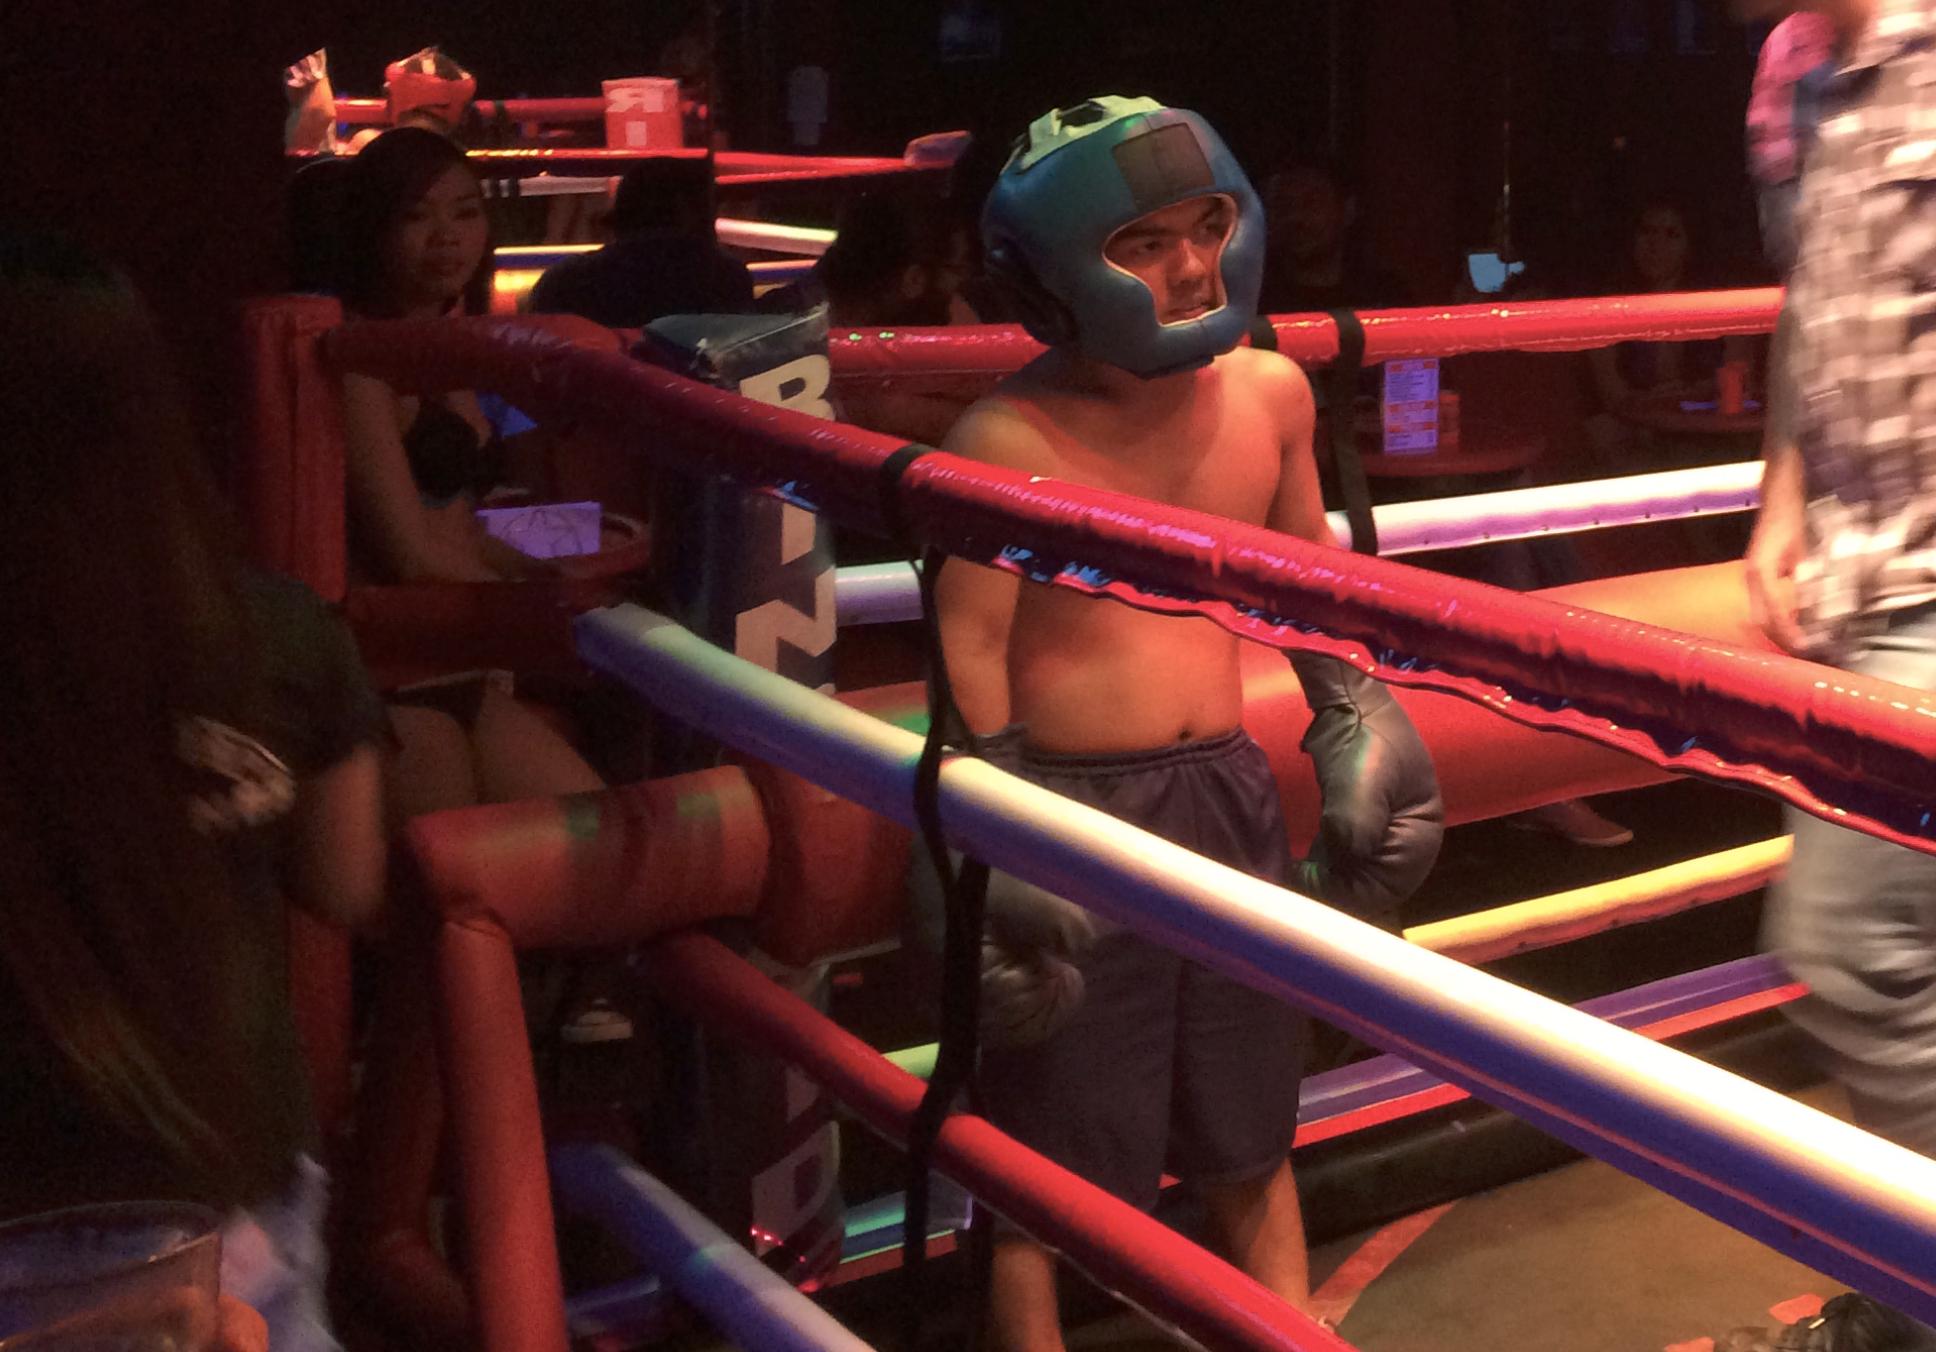 A midget boxer prepares for the next round.